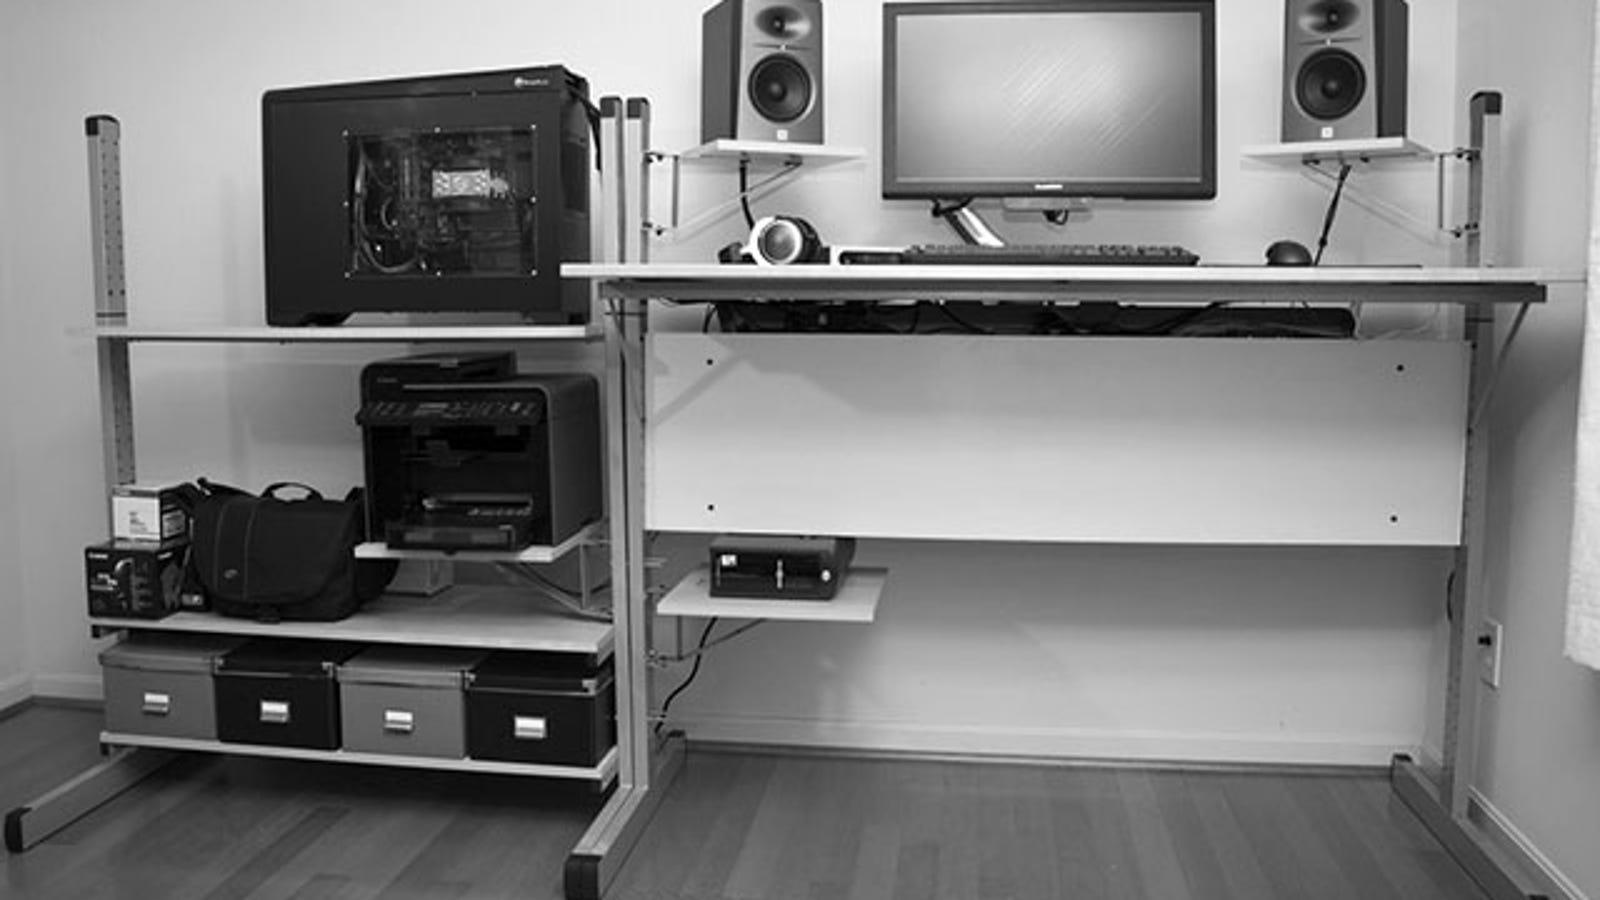 The Custom Standing Workspace